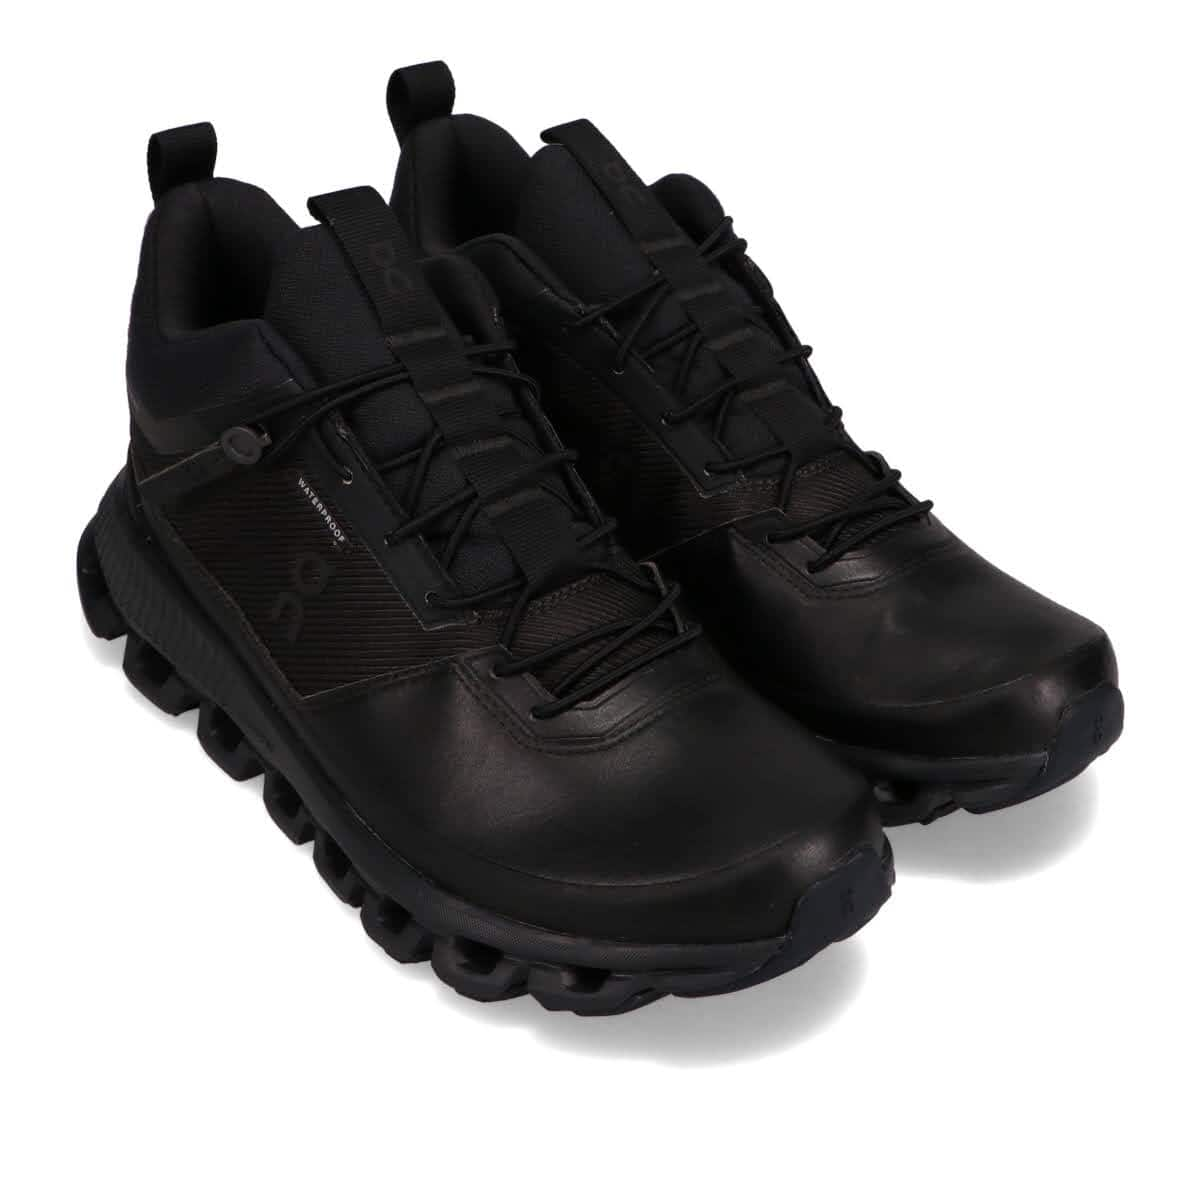 On Cloud Hi Waterproof All Black 20SS-I_photo_large